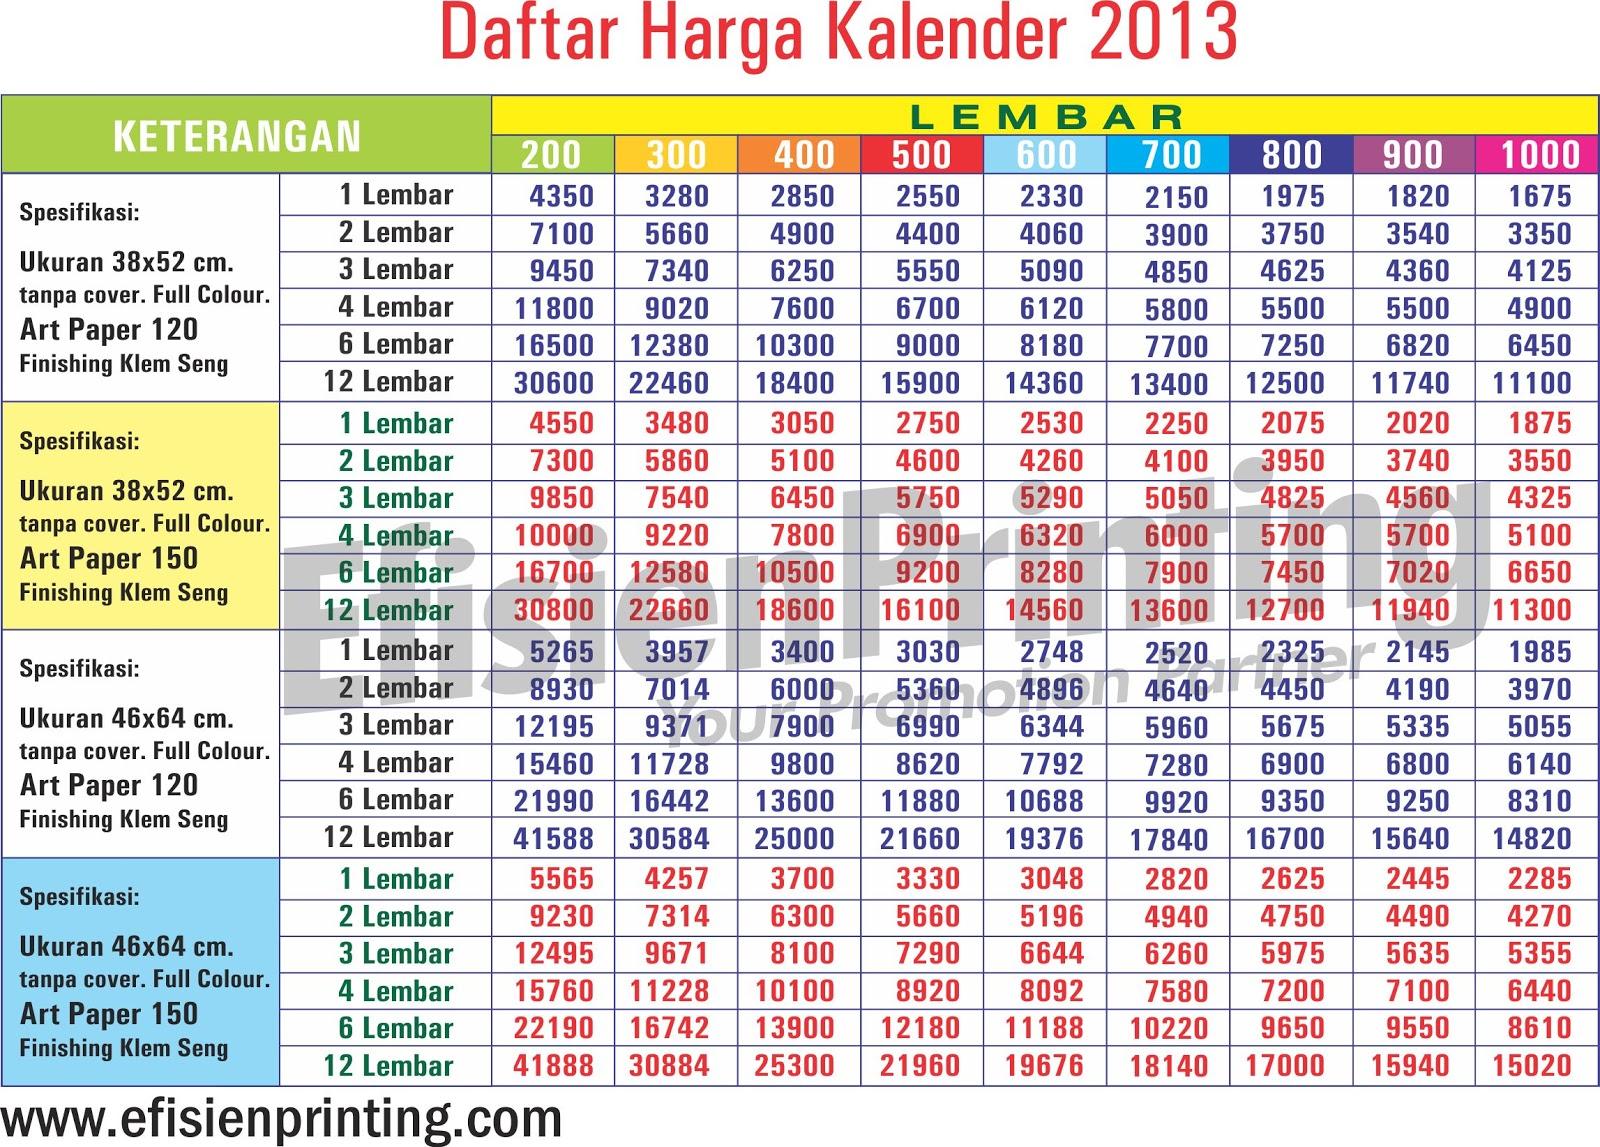 Siapkan Kalender 2013